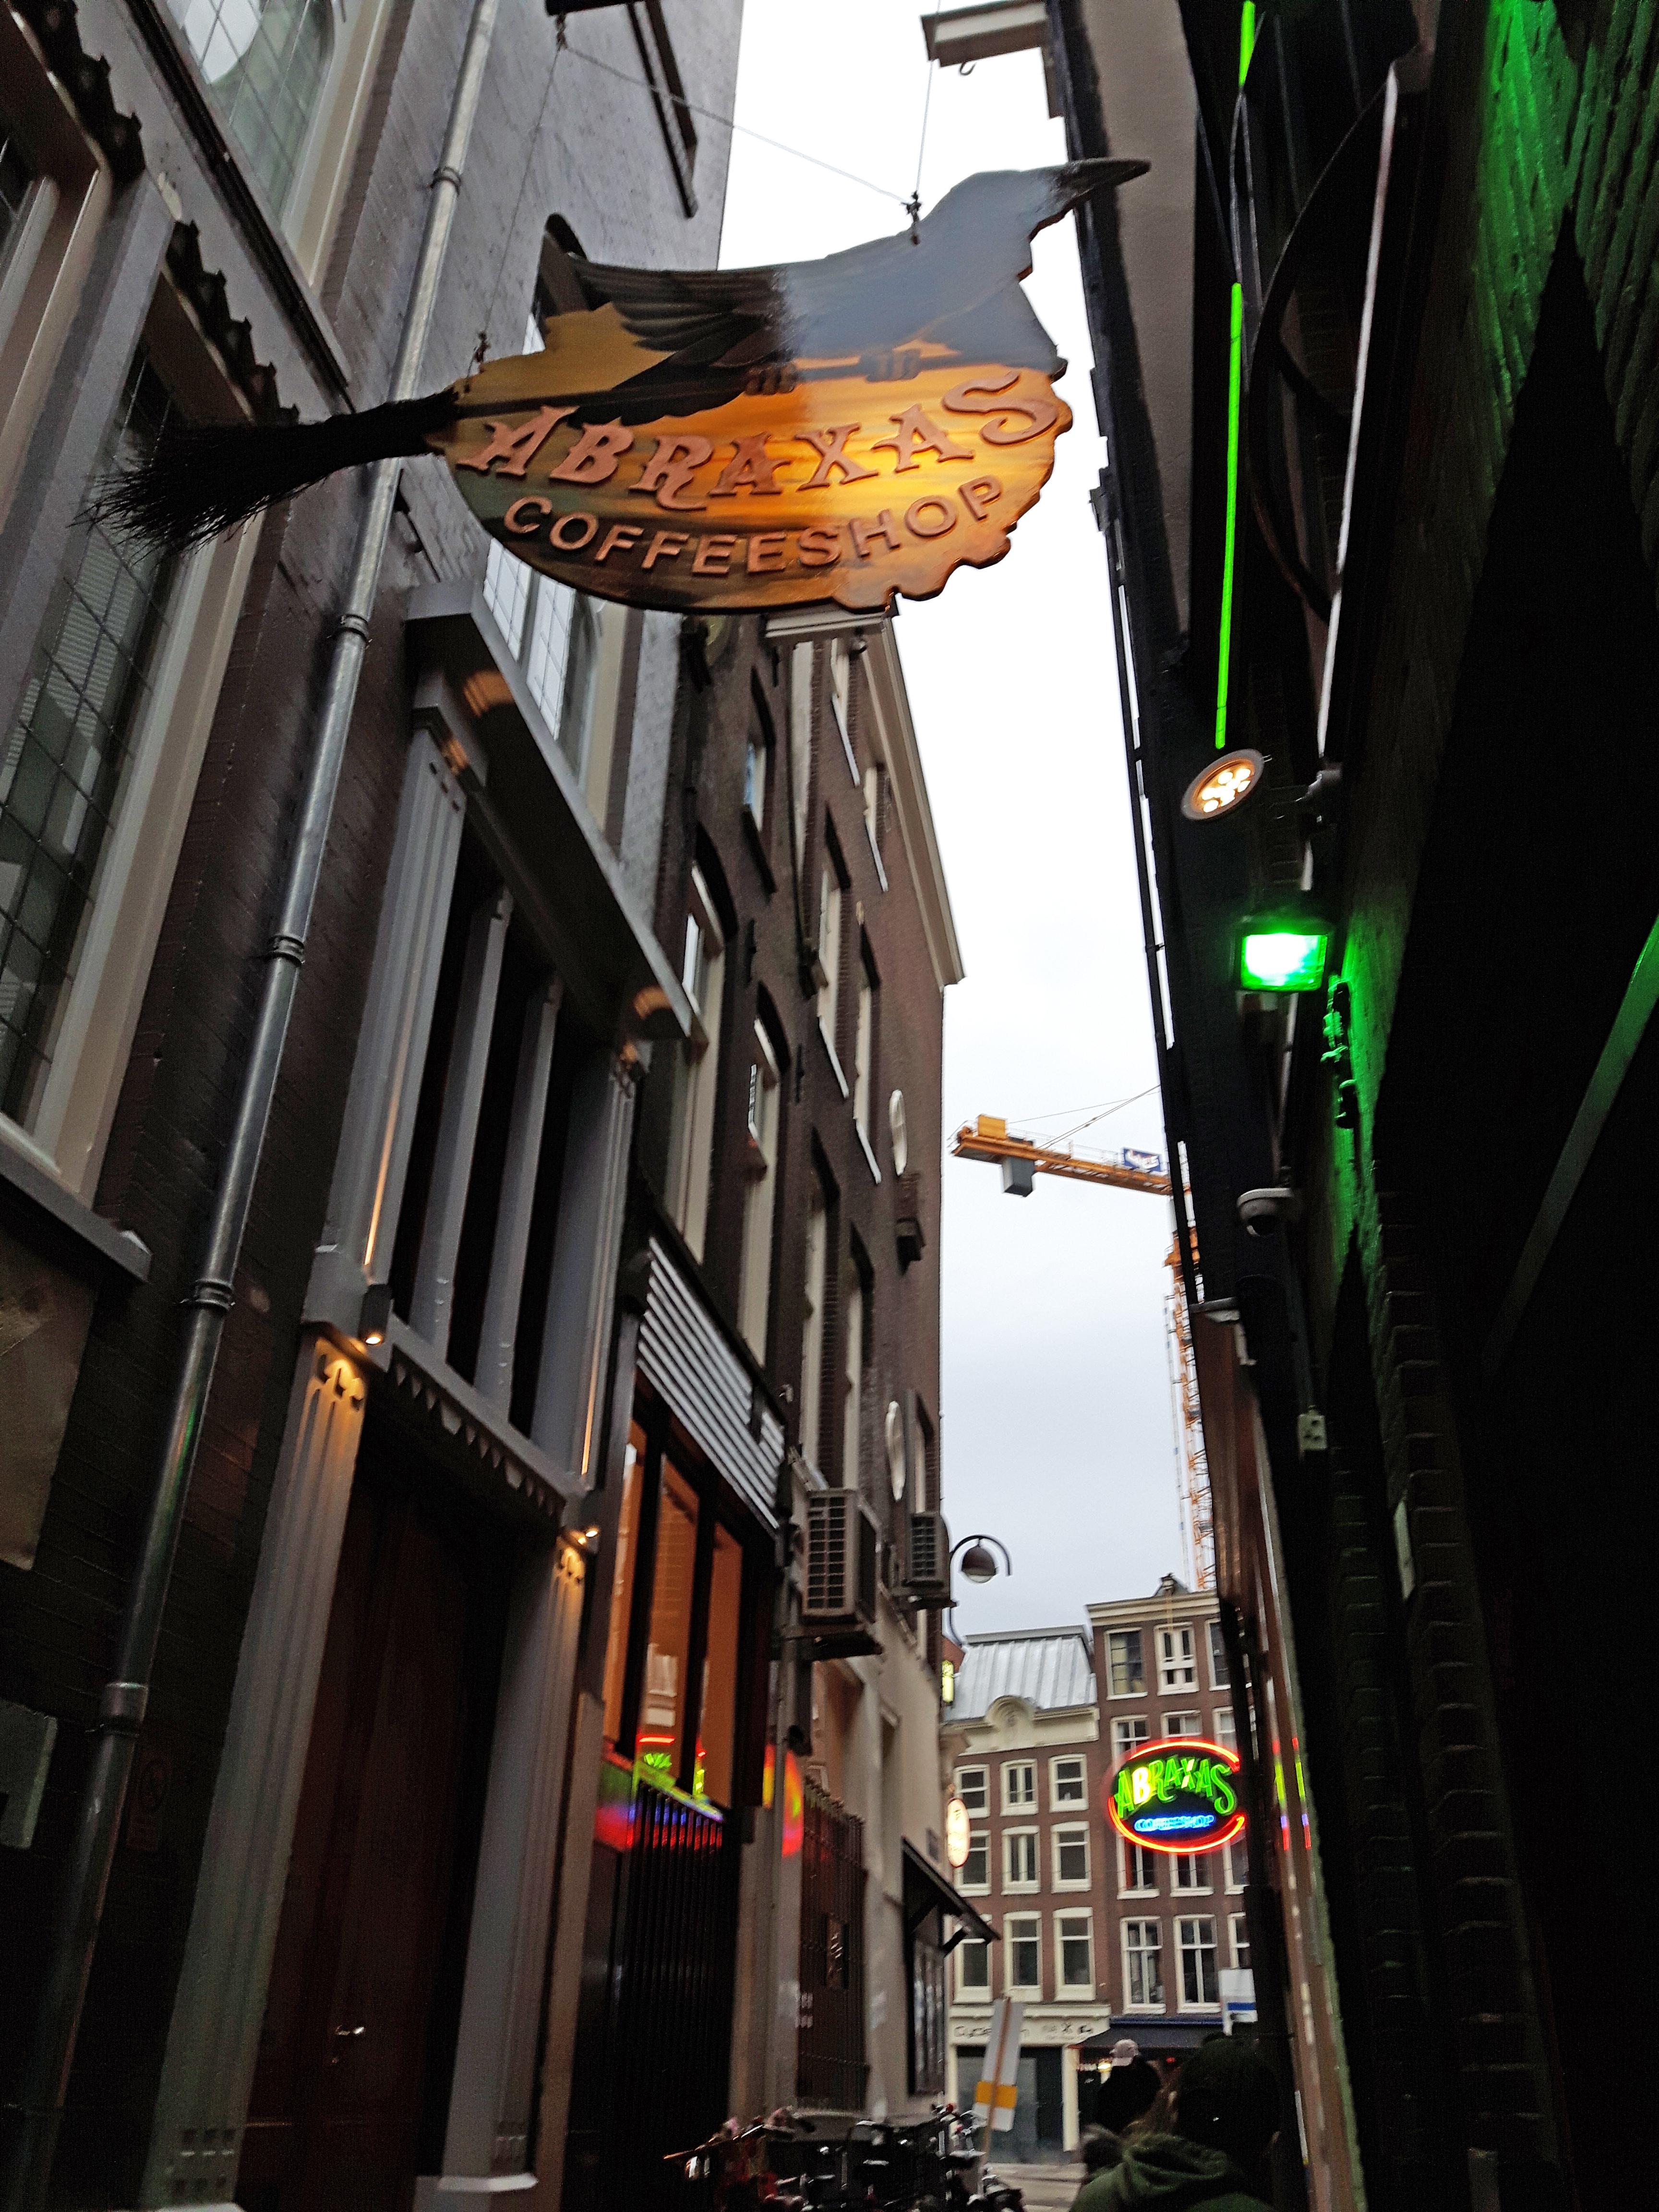 Abraxas_Coffeeshop_Amsterdam_Netherlands